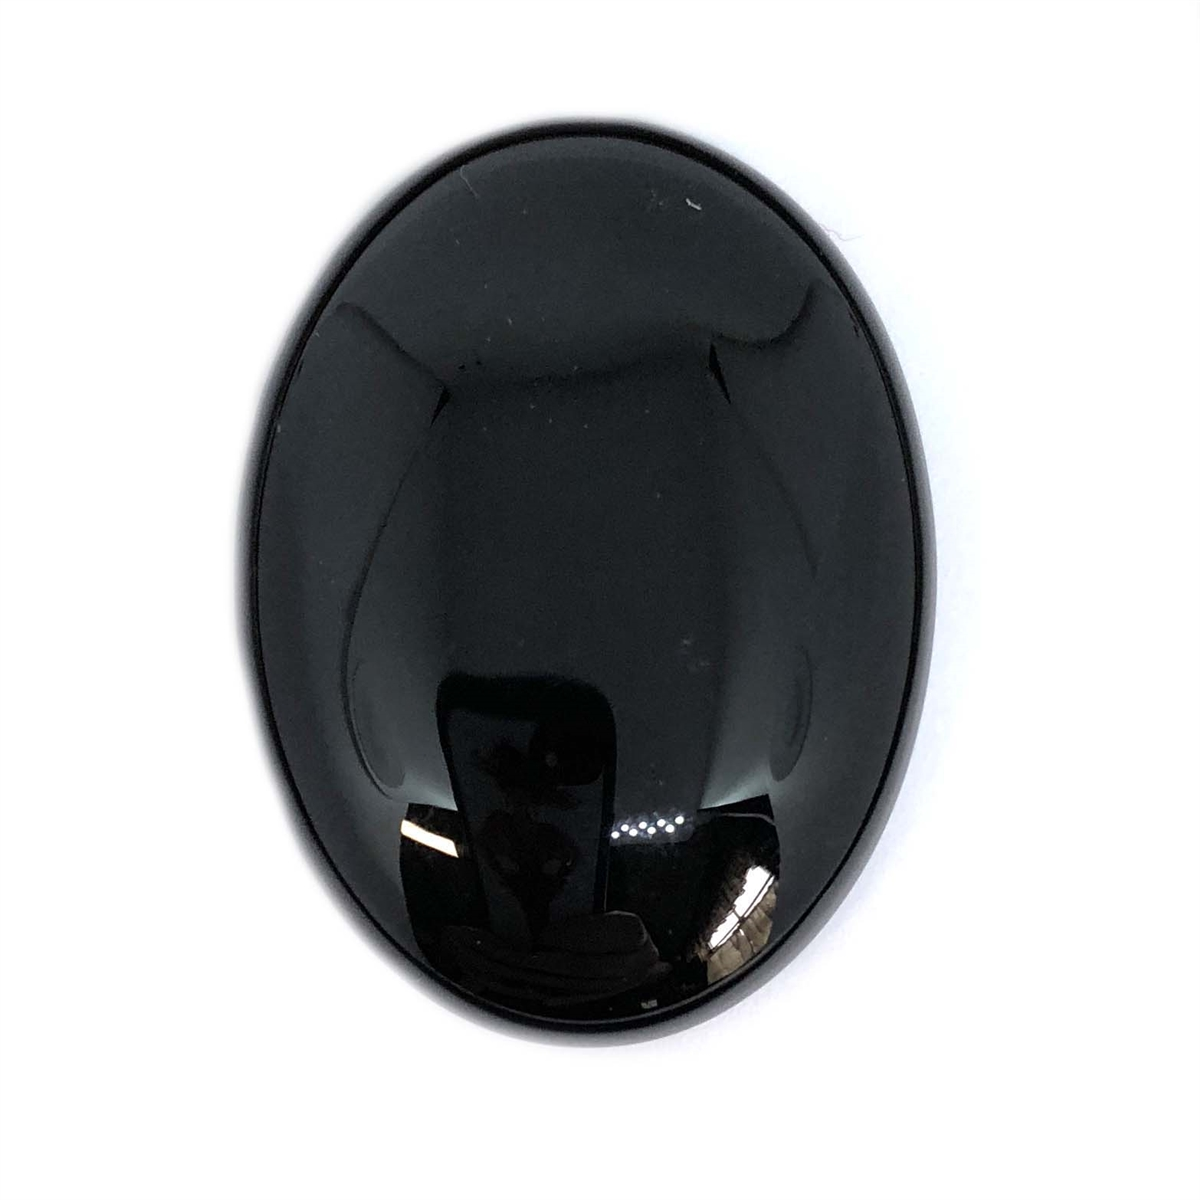 Marble Black Onyx : Black onyx stone semi precious focal